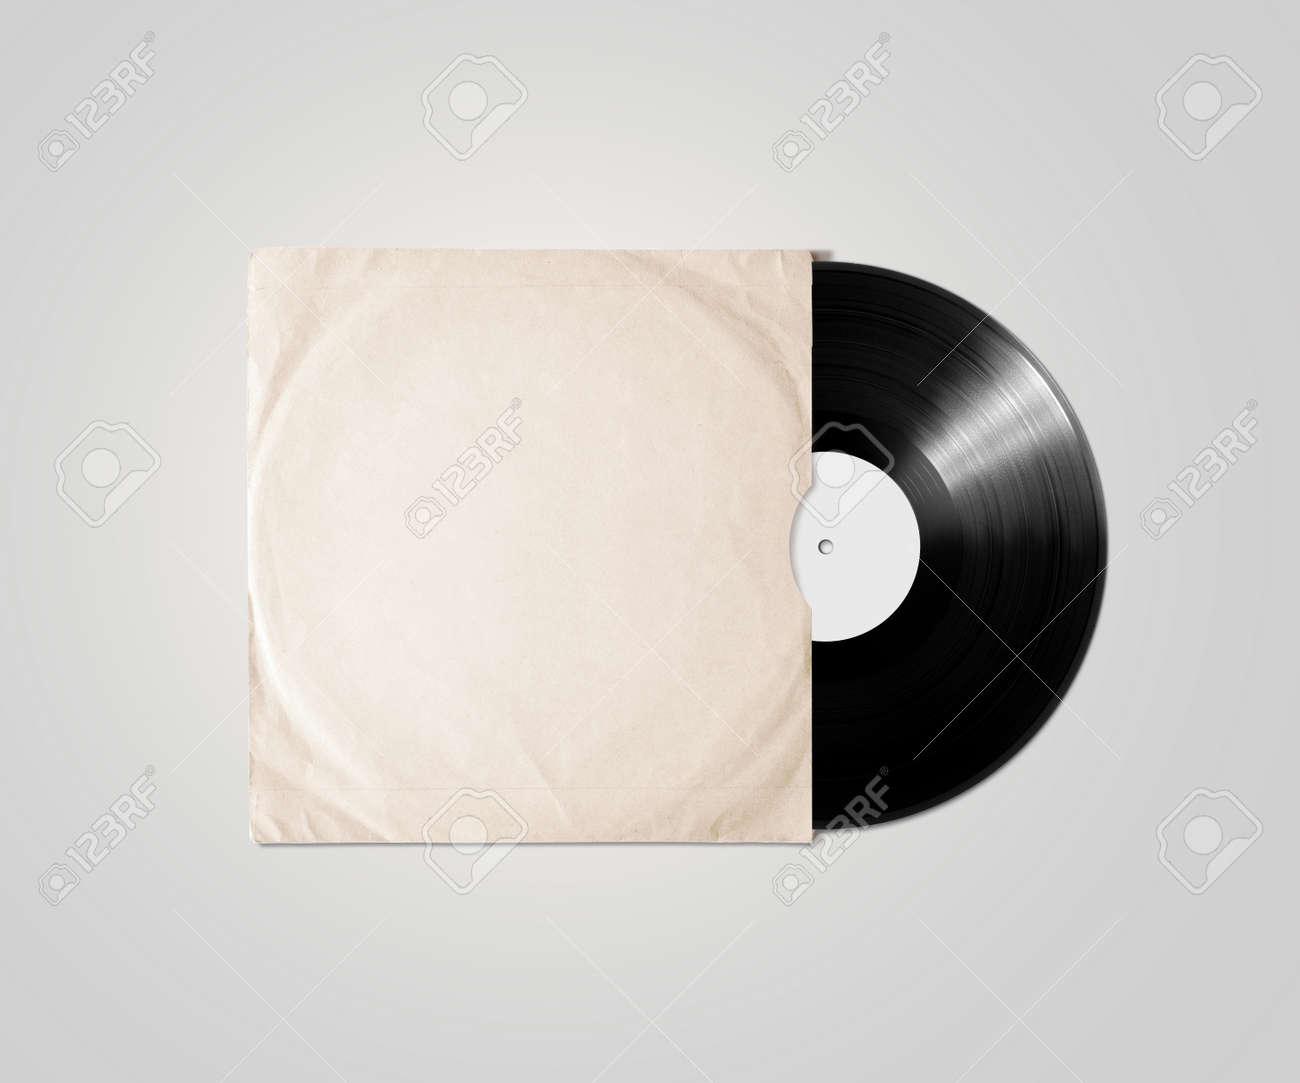 Blank Vinyl Album Cover Sleeve Mockup Isolated Gramophone Music